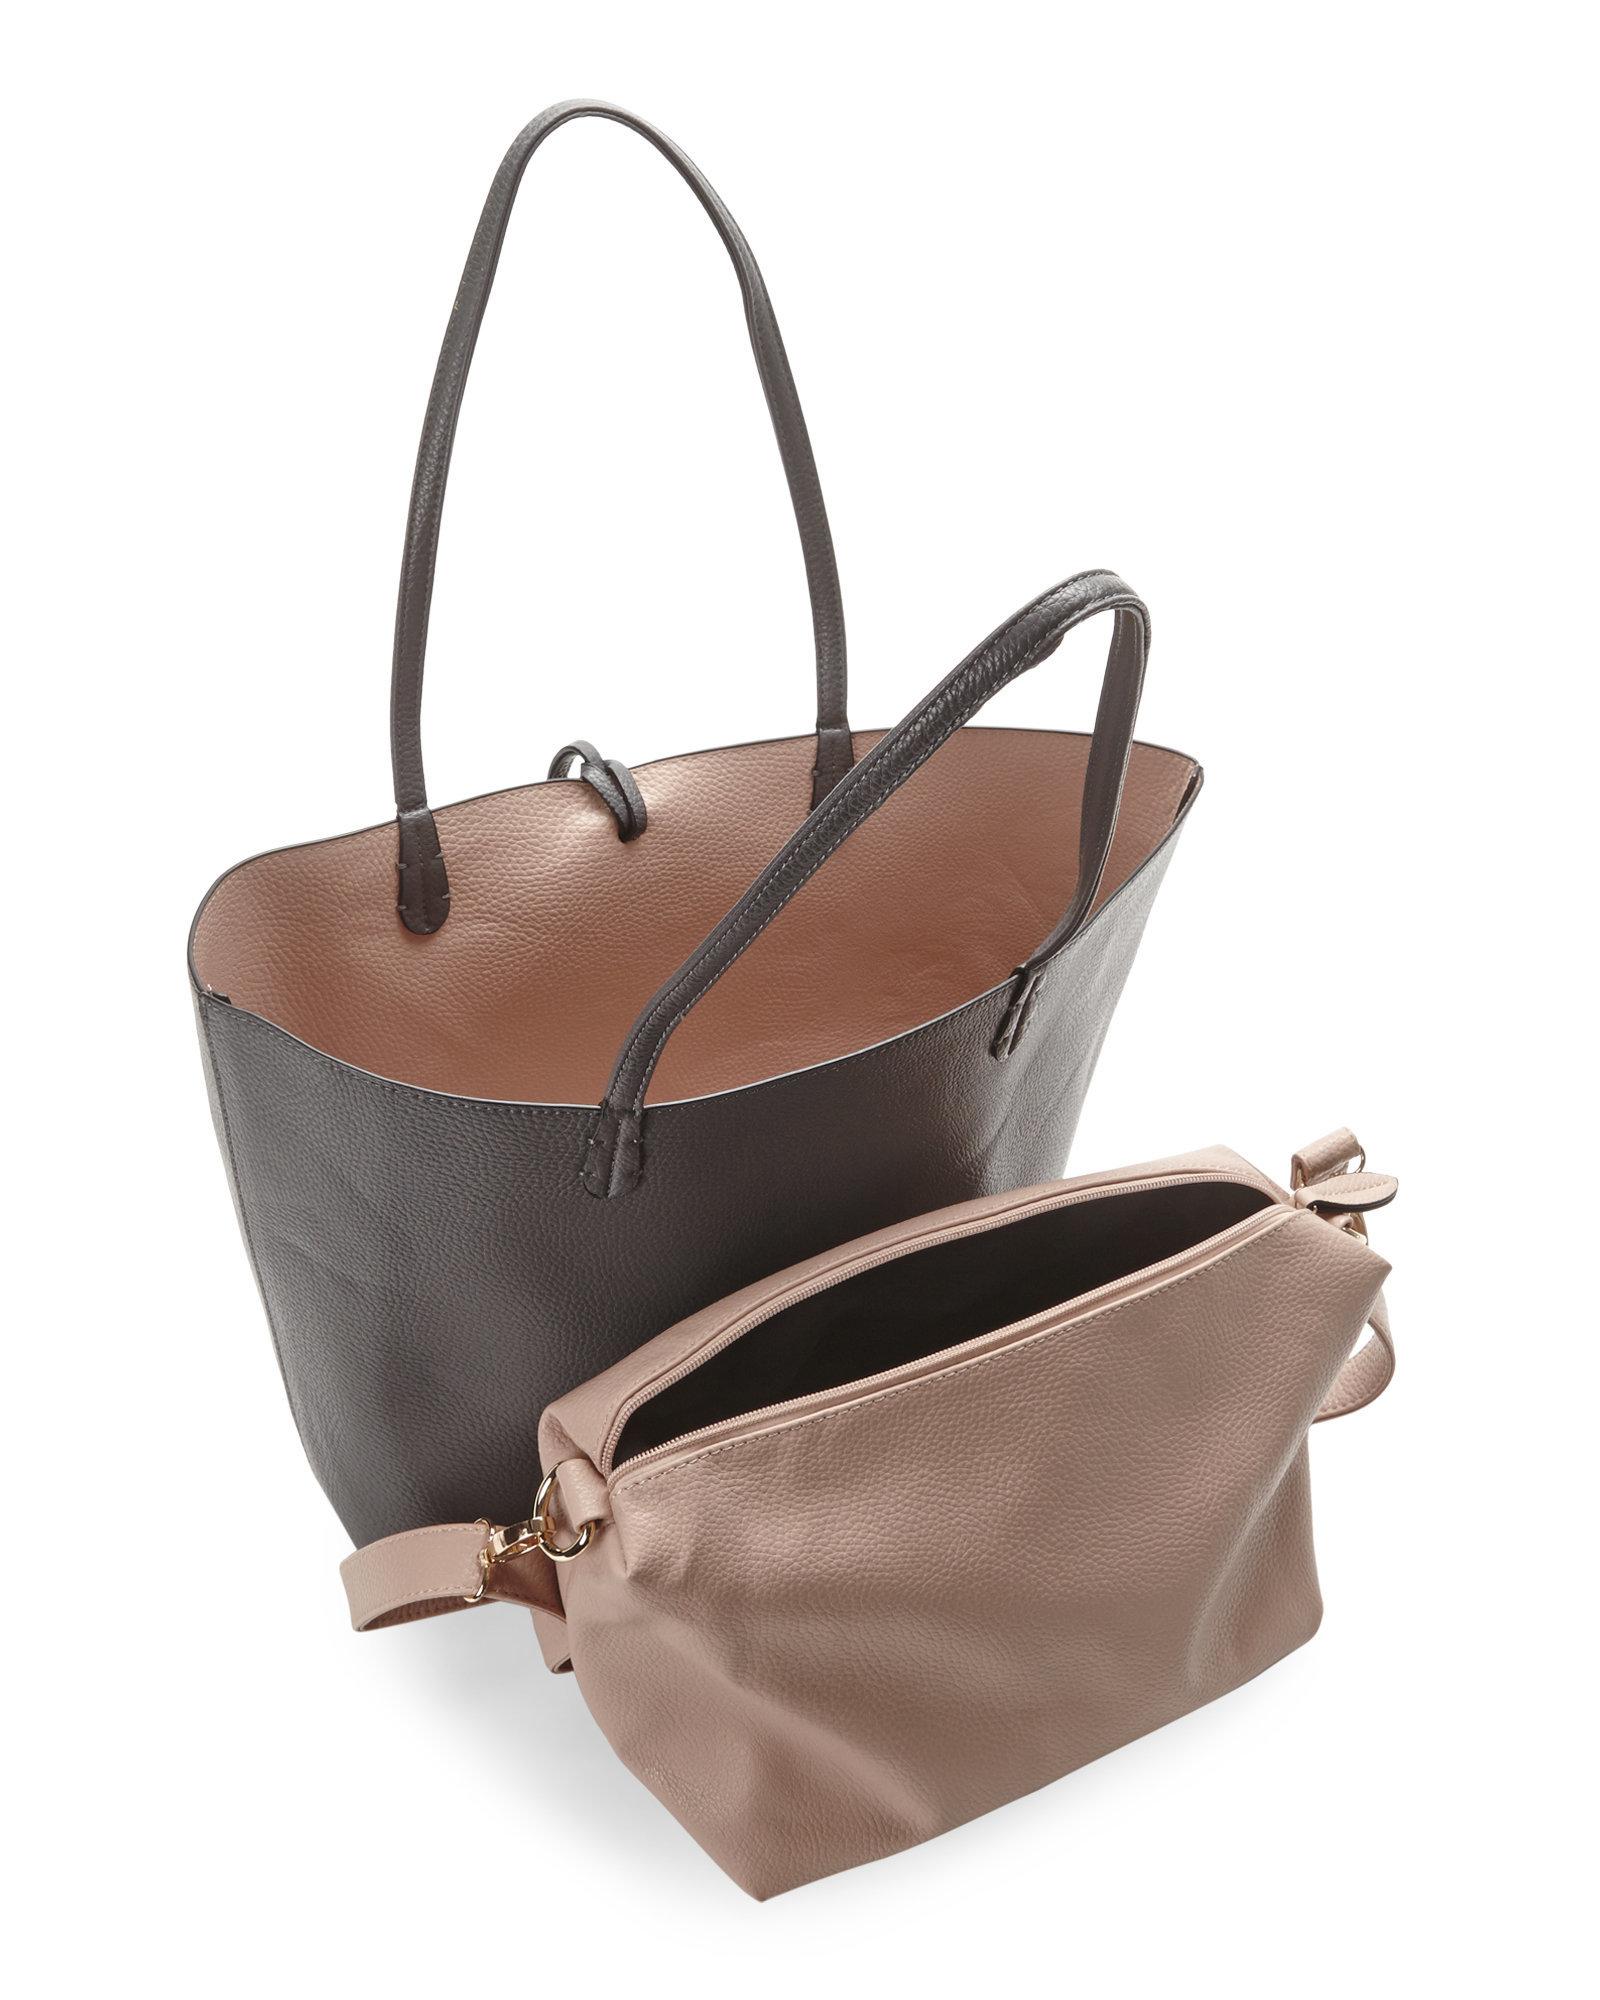 Reversible Tote Handbags Confederated